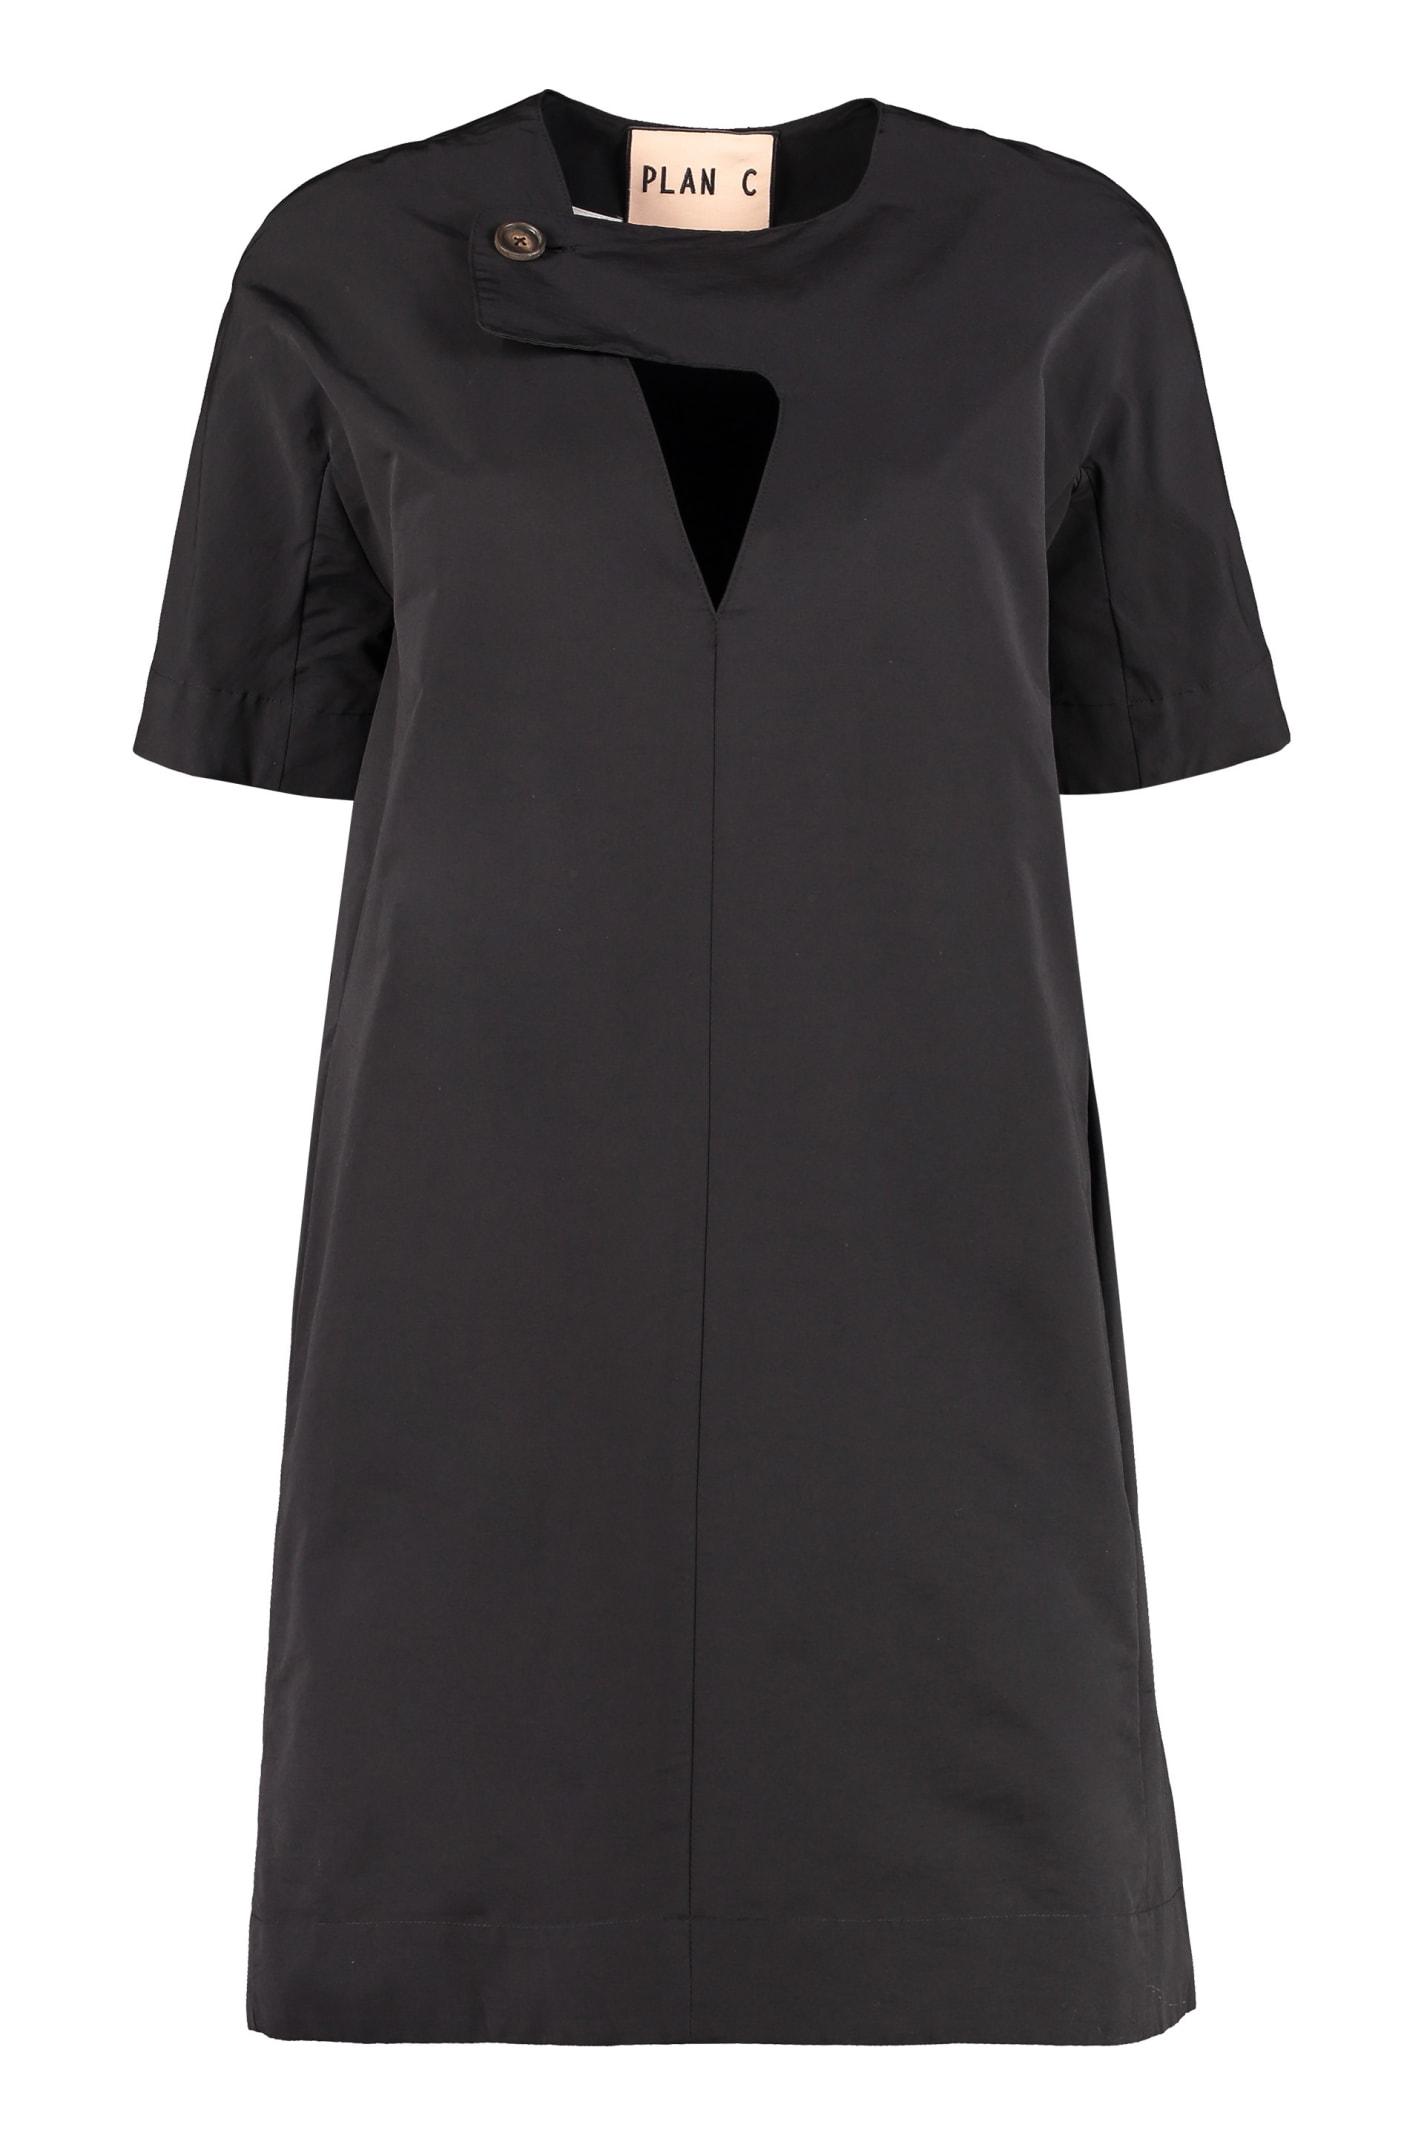 Buy Plan C Cotton-blend Dress online, shop Plan C with free shipping